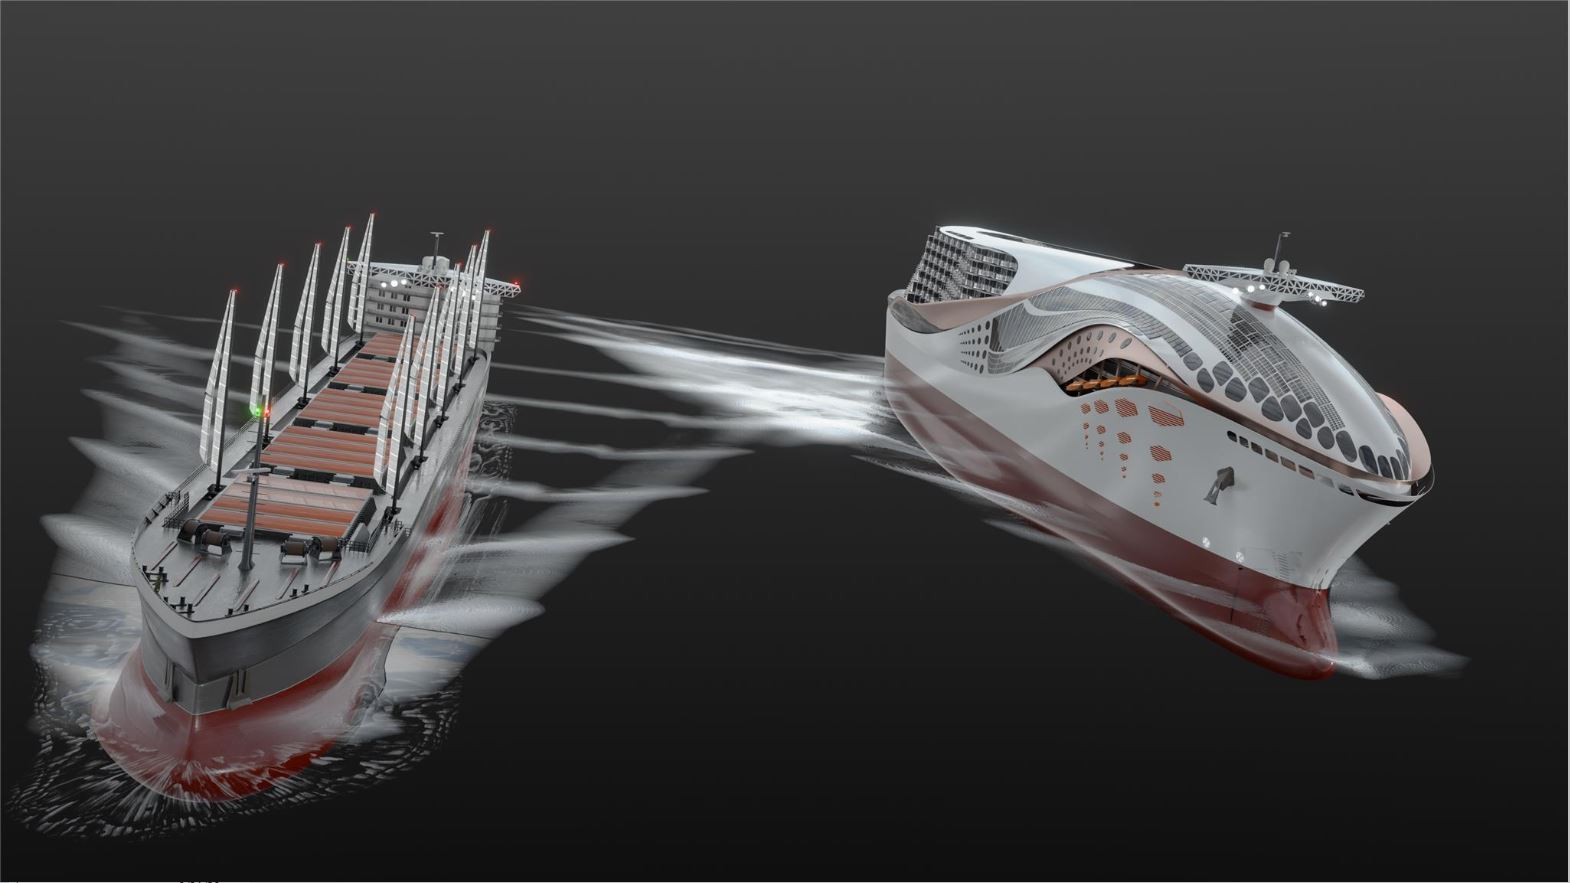 Wärtsilä to build hydrogen cruise ship engine for EU research project